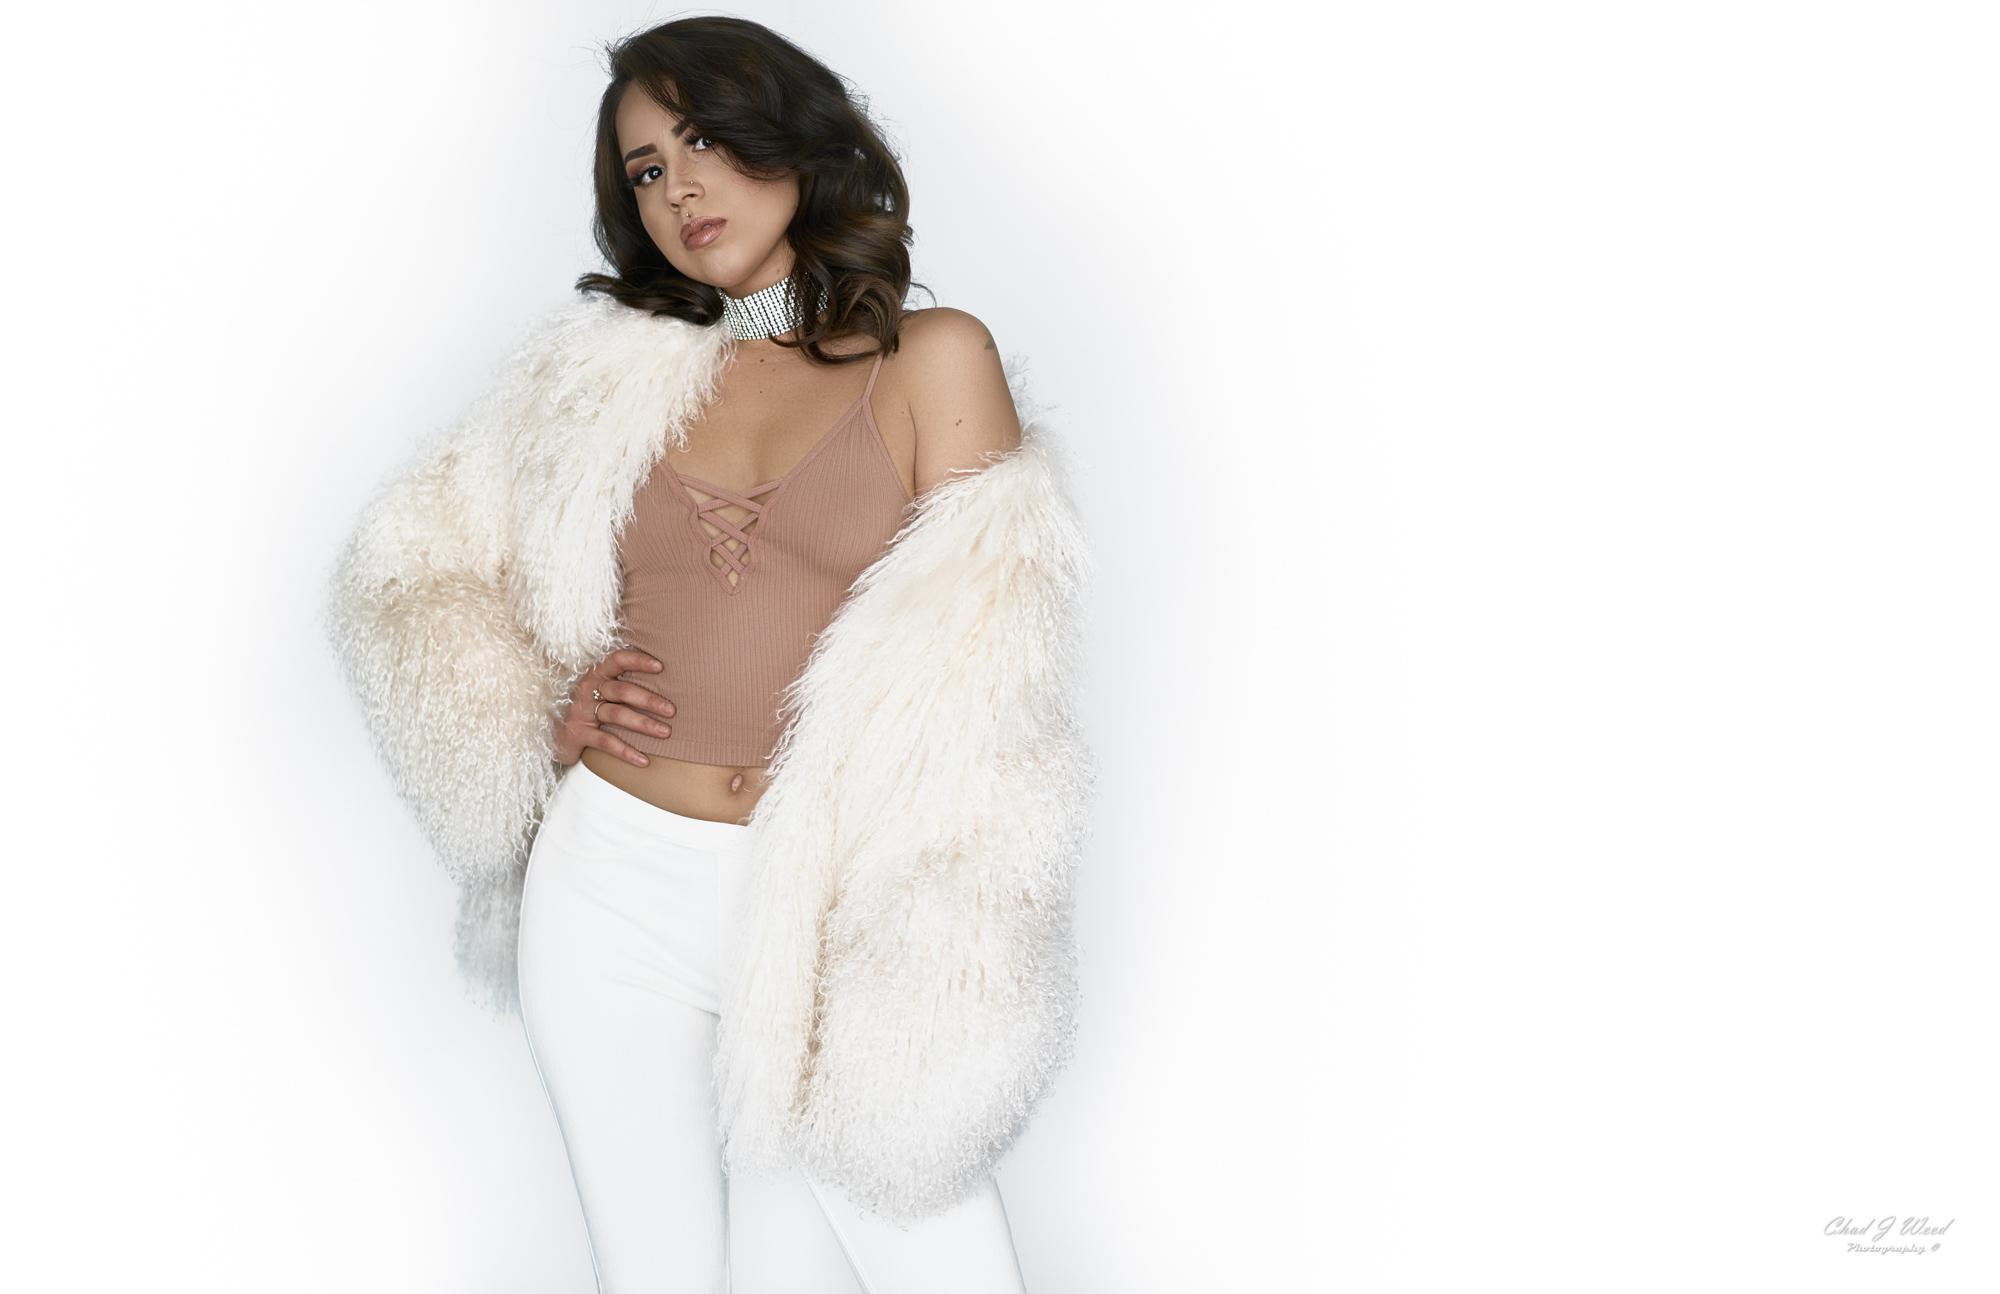 Carissa Glamour Model by Mesa Arizona Portrait Photographer Chad Weed